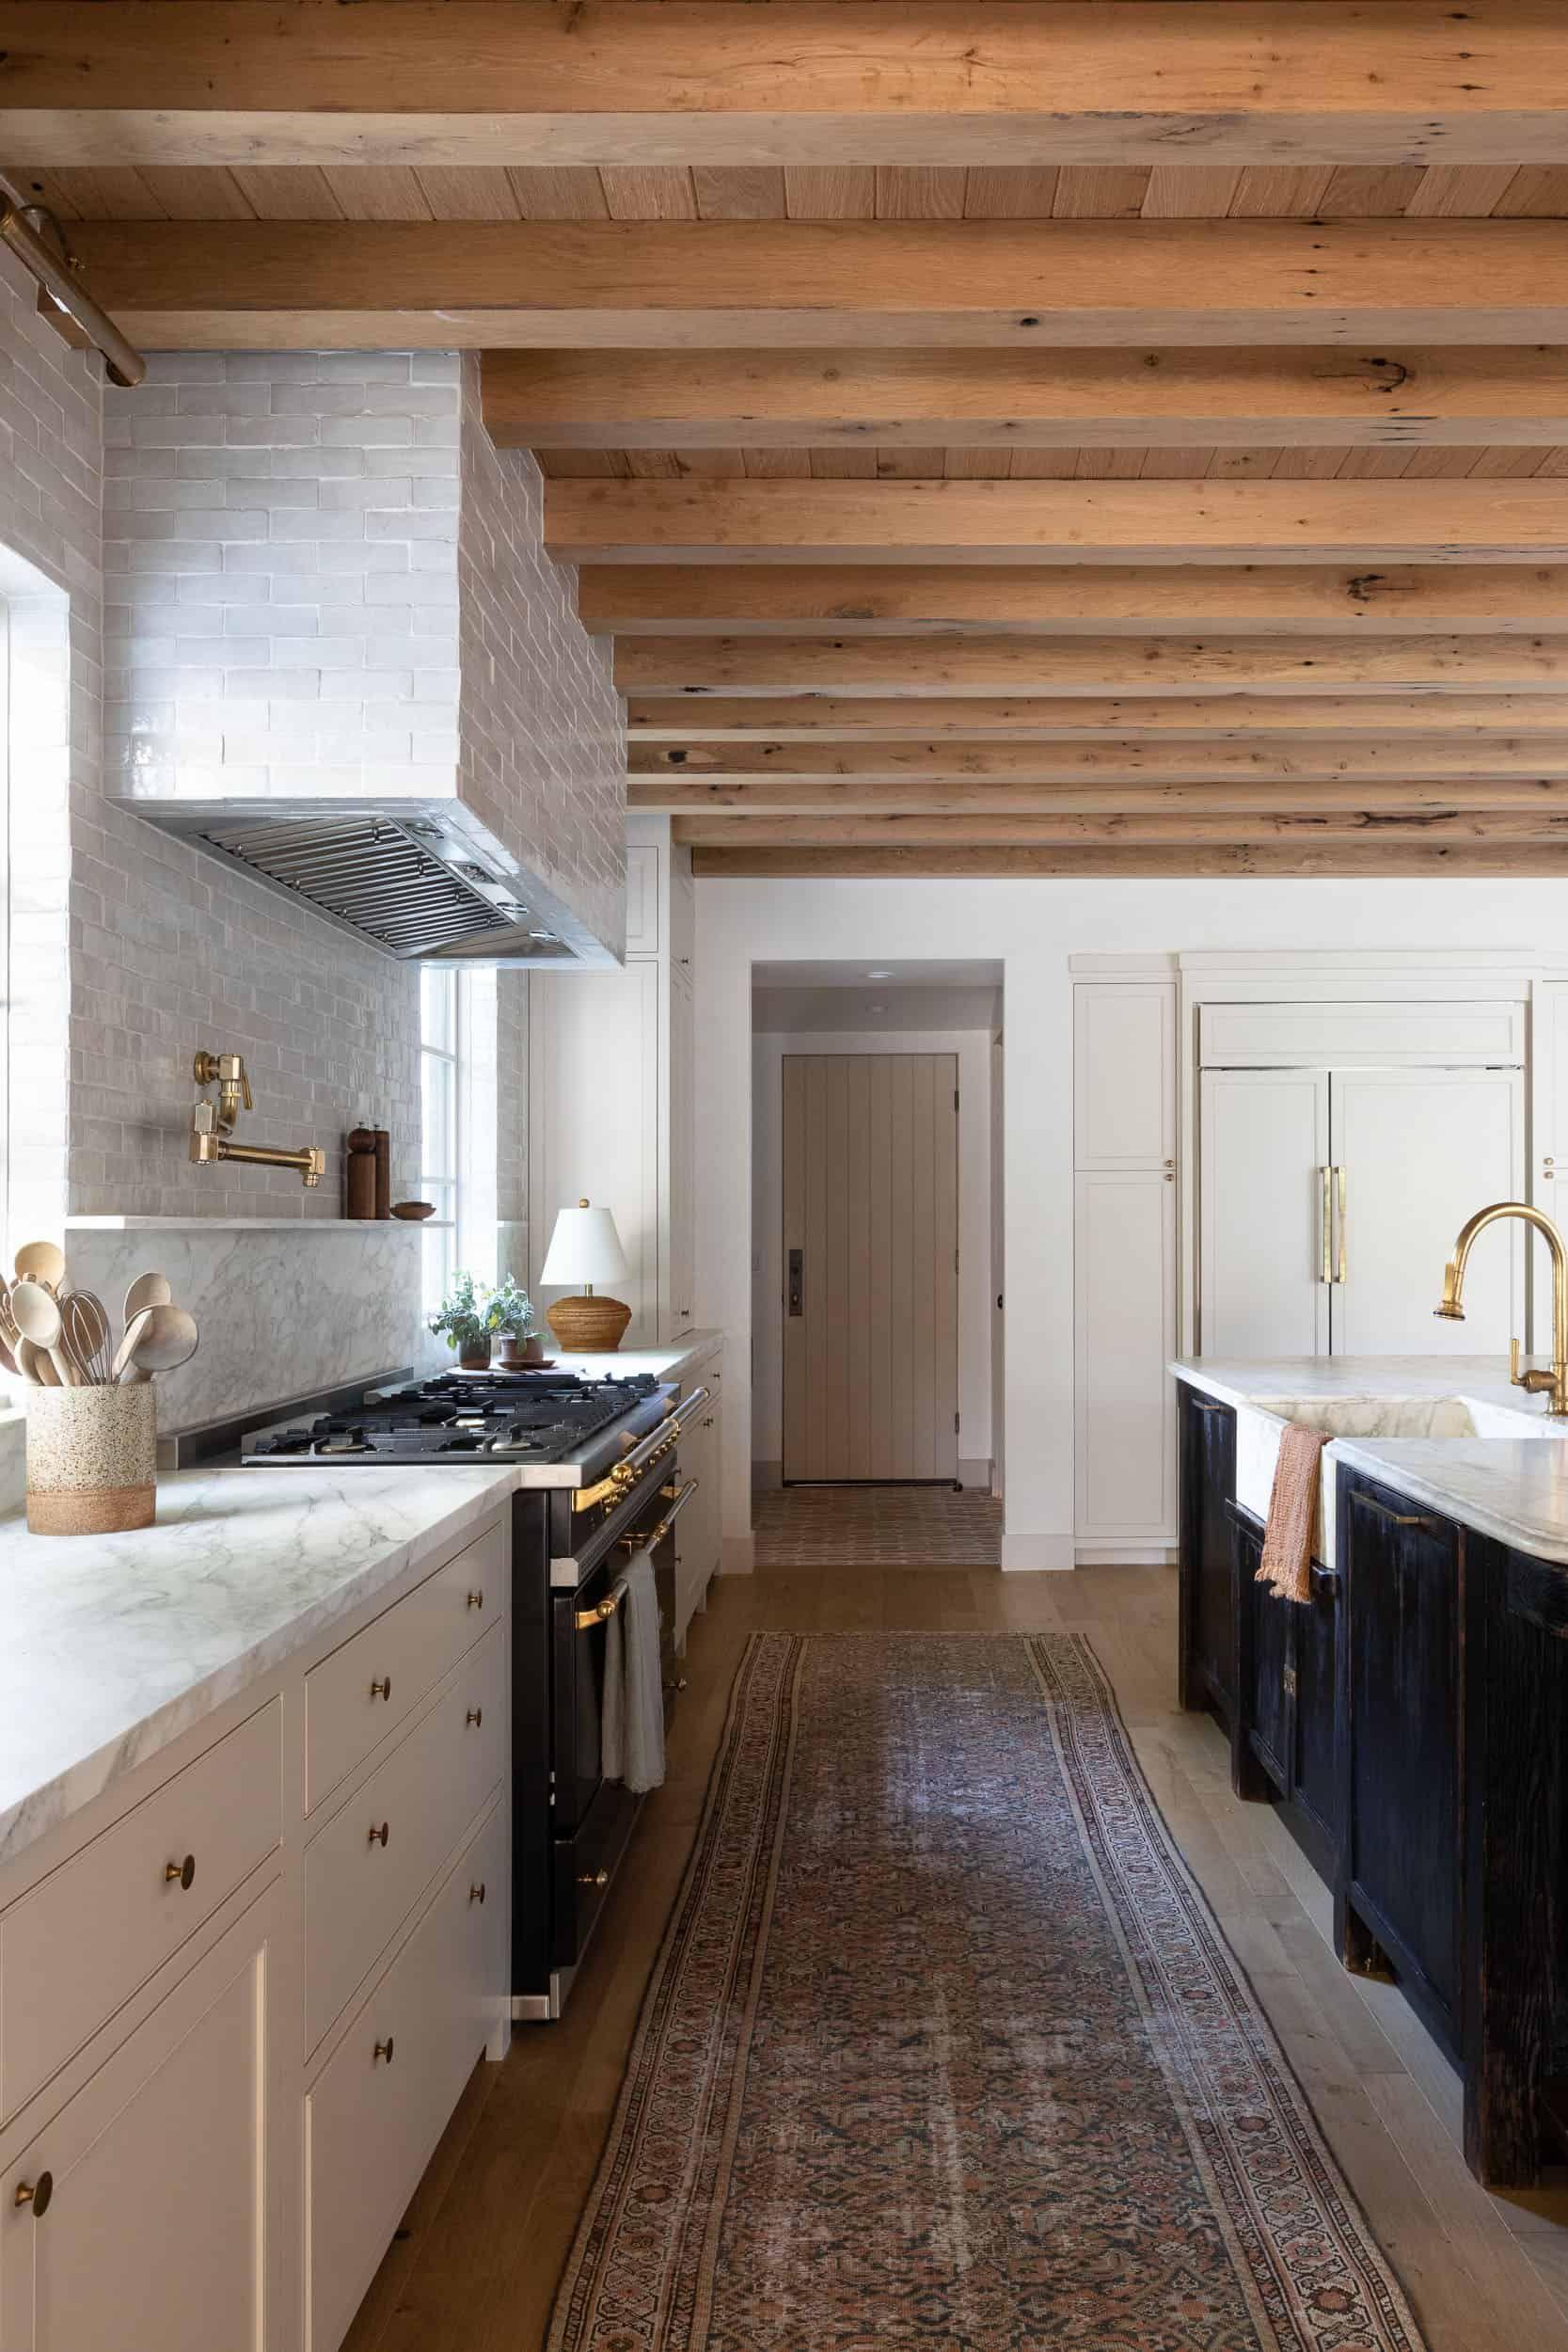 West Coast Style Meets Modern Farmhouse In This Unforgettable La Home In 2021 Amber Interiors Kitchen Kitchen Design